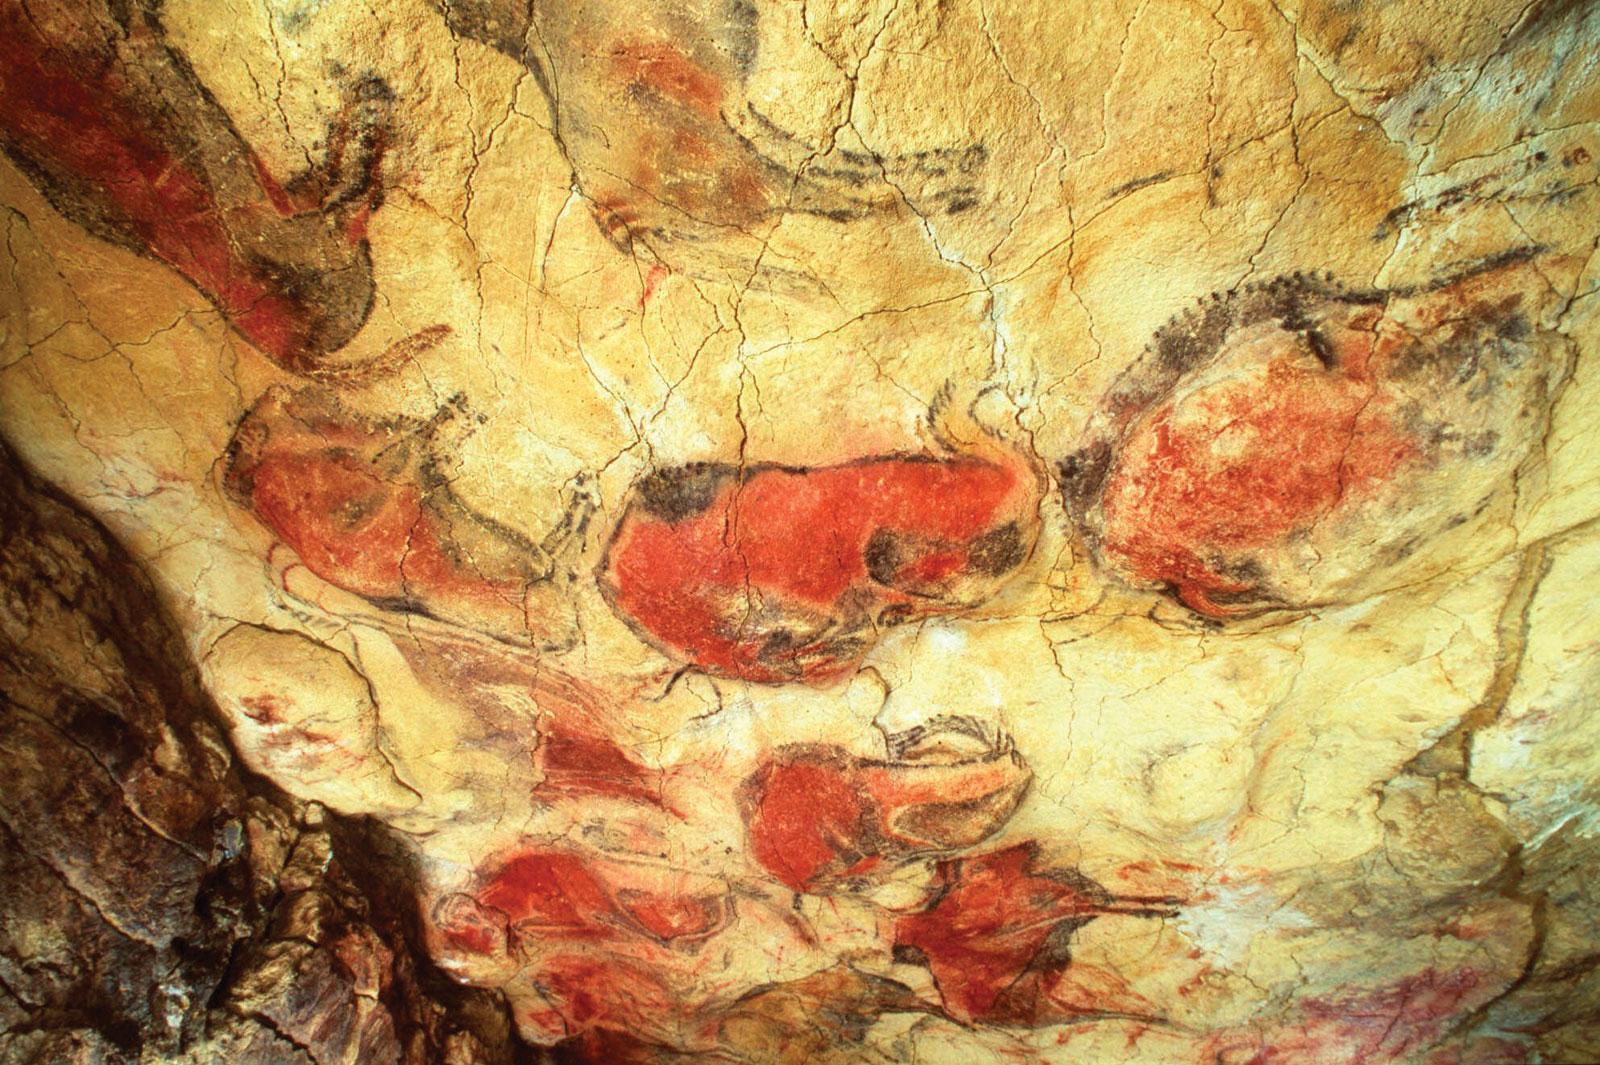 grotte di lascaux ..